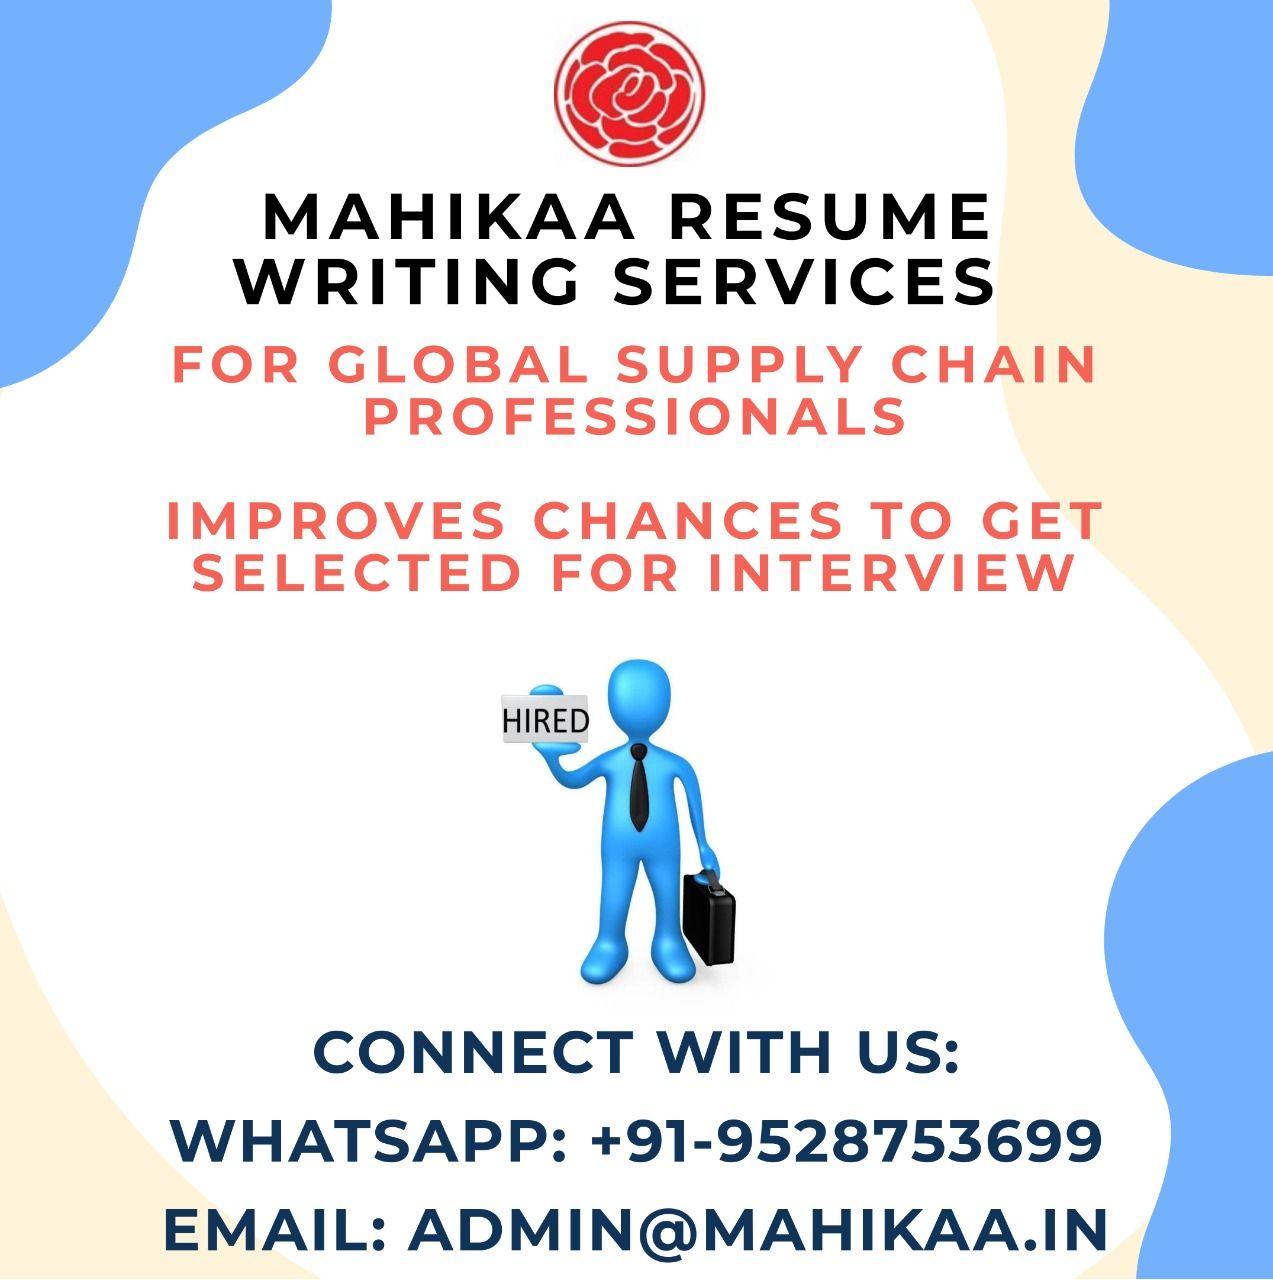 Mahikaa resume writing services for freshers get